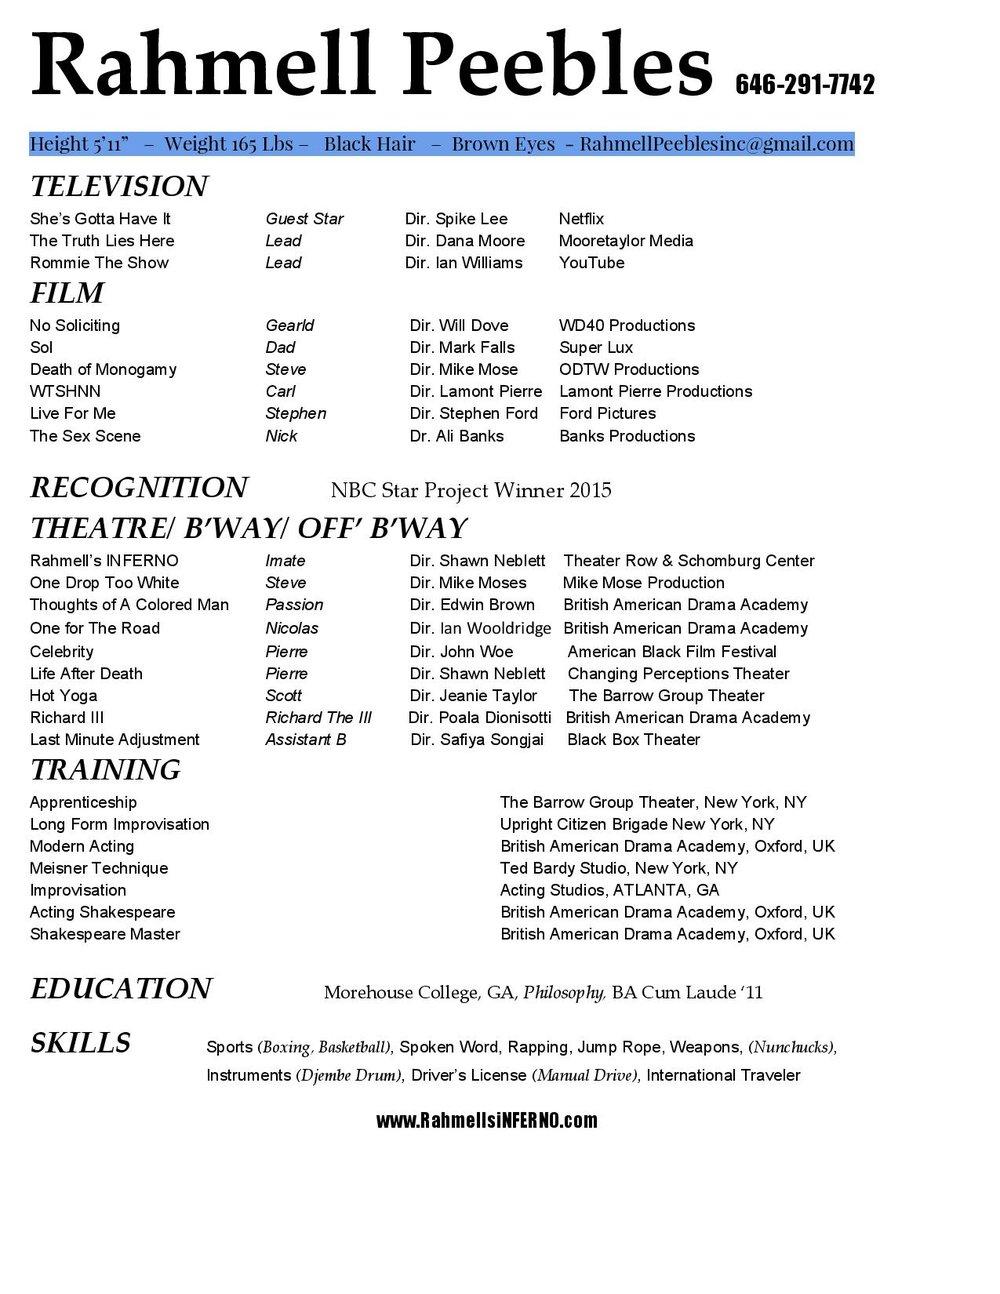 Rahmell Peebles Acting Resume-page-001.jpg